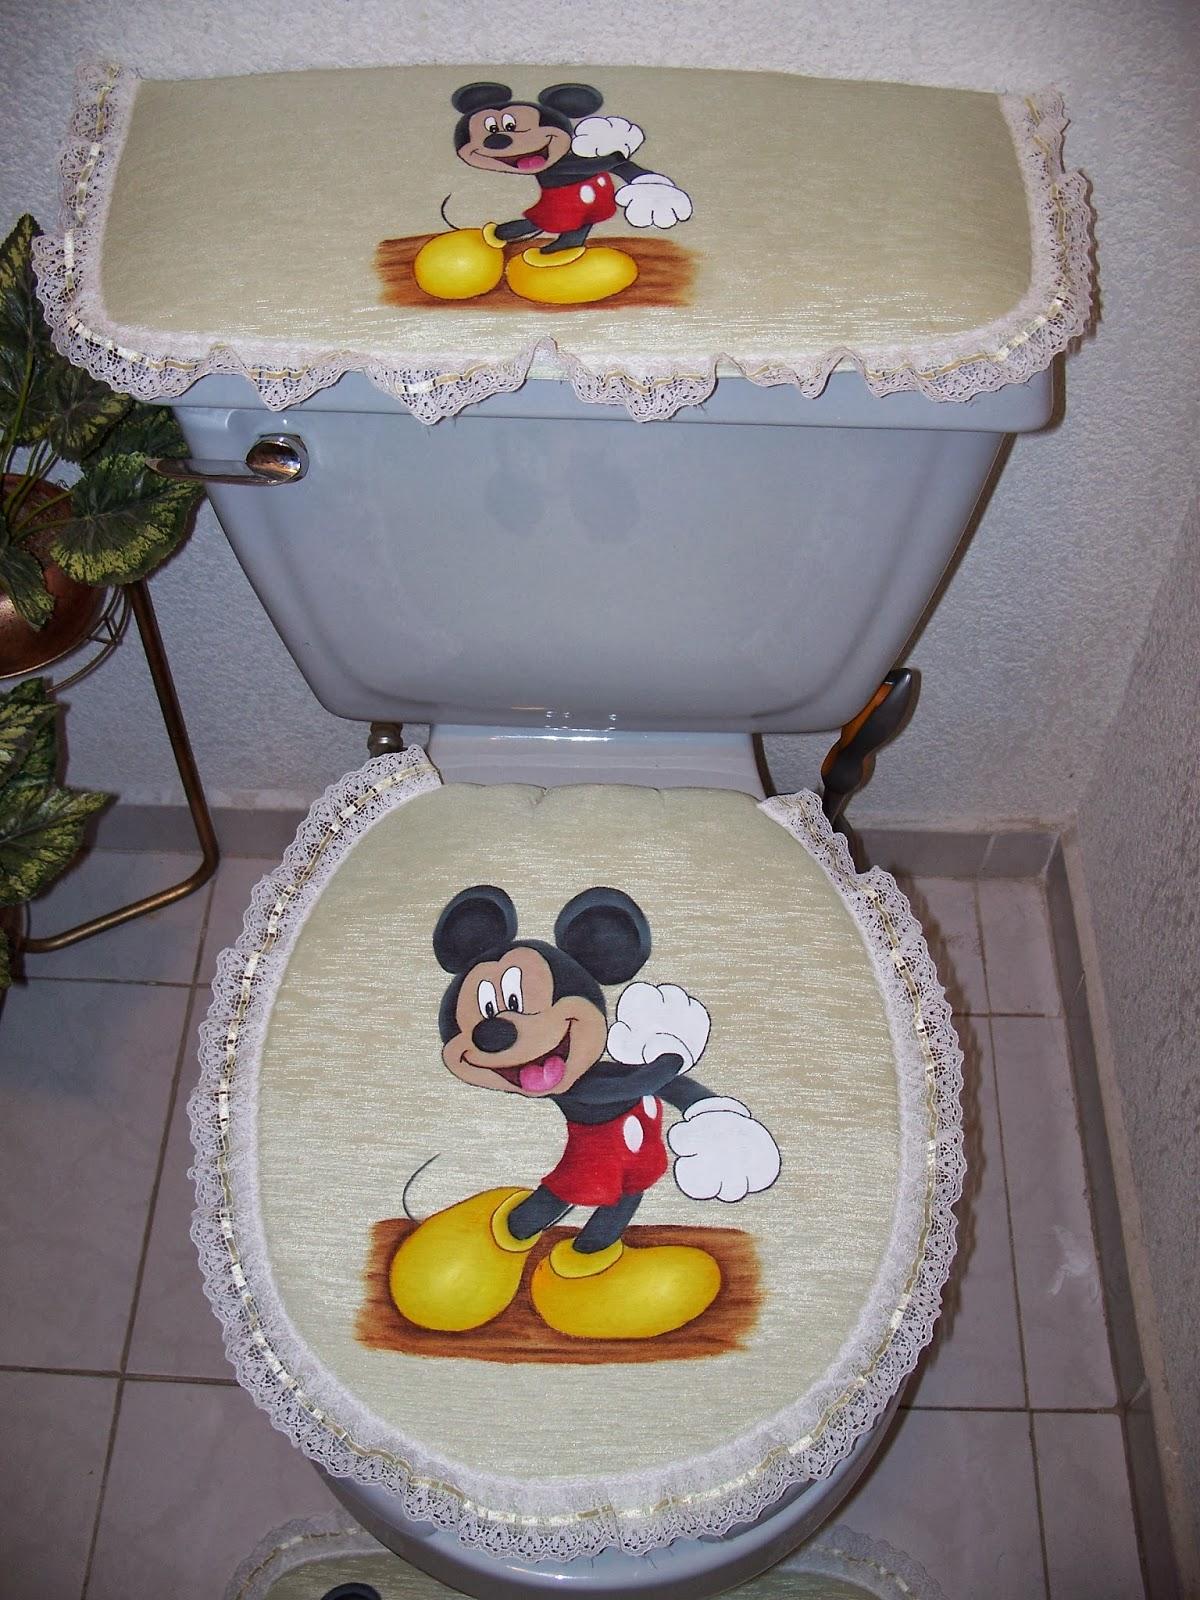 Utilisima Lenceria Juegos De Baño: las flores con pinceladas de colores: Juego de baño de Mickey Mouse